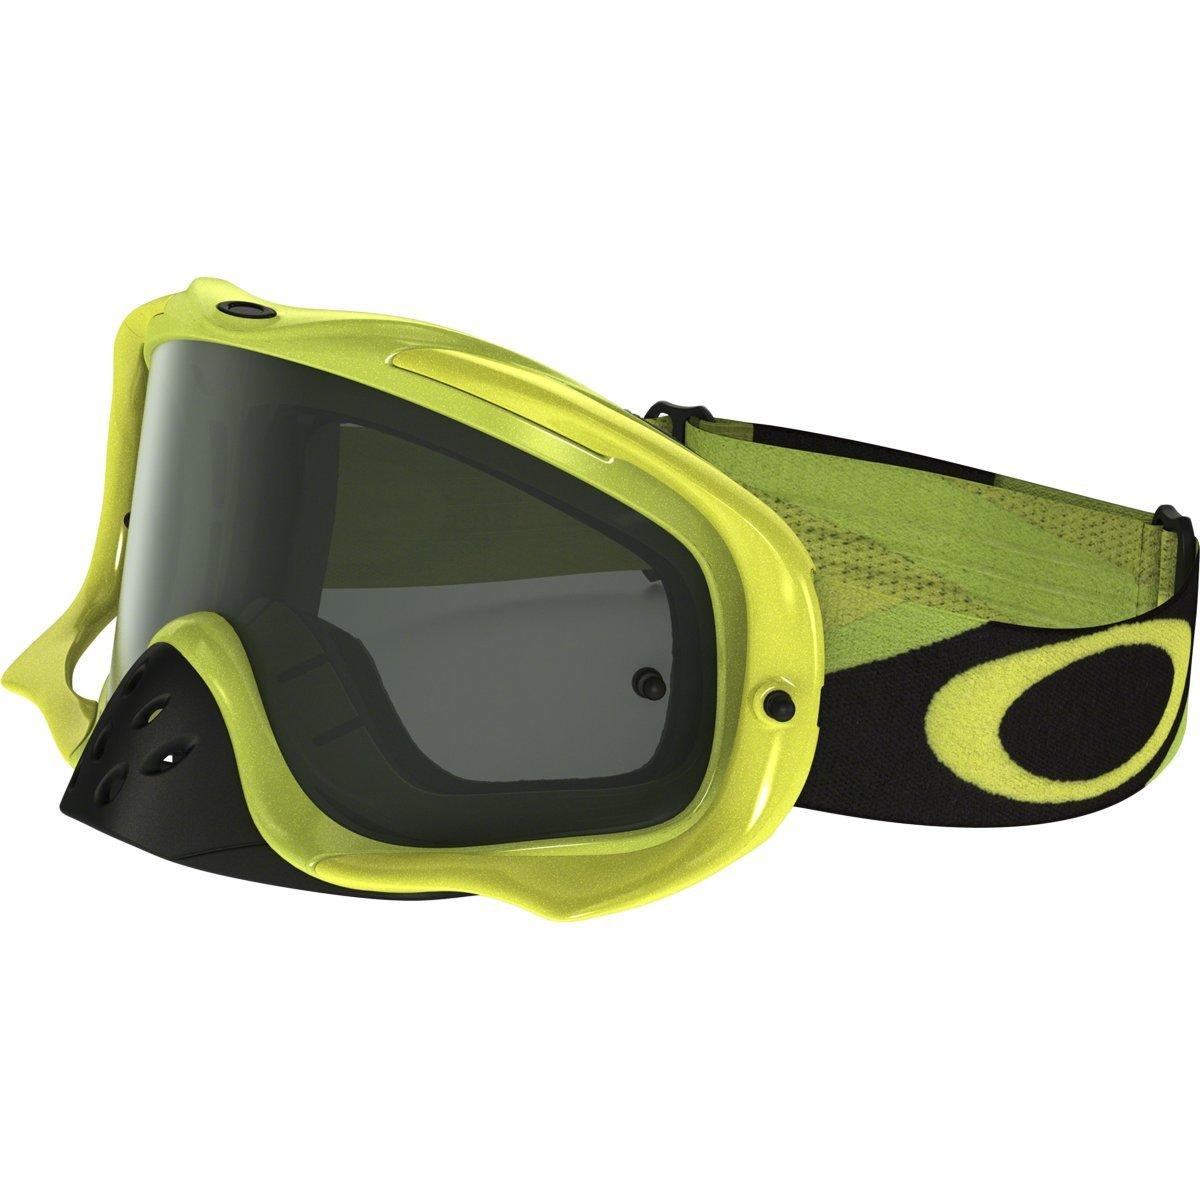 f67bb8c31ebc Amazon.com  Oakley Crowbar MX Heritage Racer Adult Off-Road Motorcycle  Goggles Eyewear - Orange Blue Black Ice Iridium Clear   One Size Fits All   Automotive